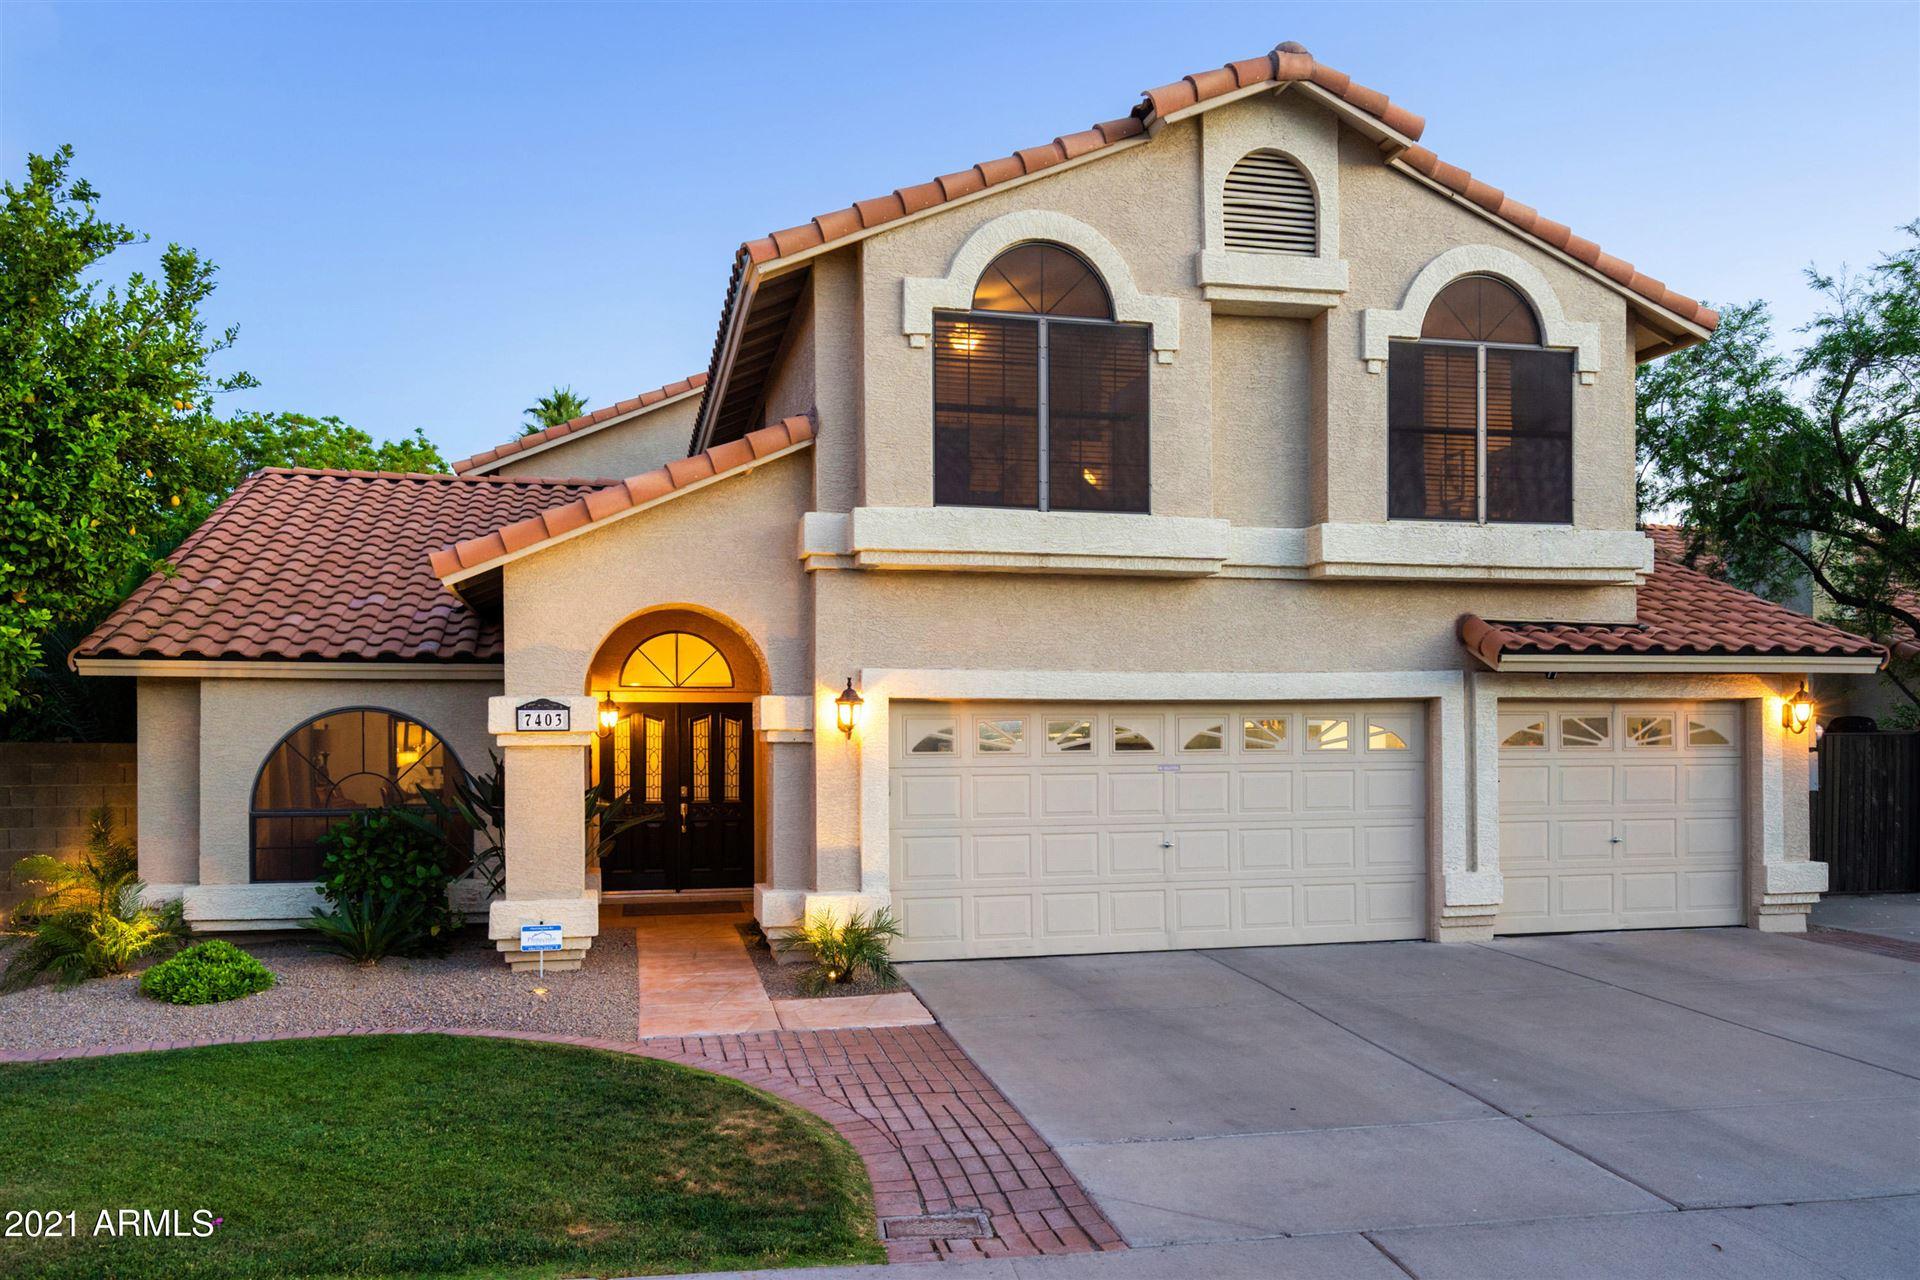 Photo of 7403 W TOPEKA Drive, Glendale, AZ 85308 (MLS # 6234012)